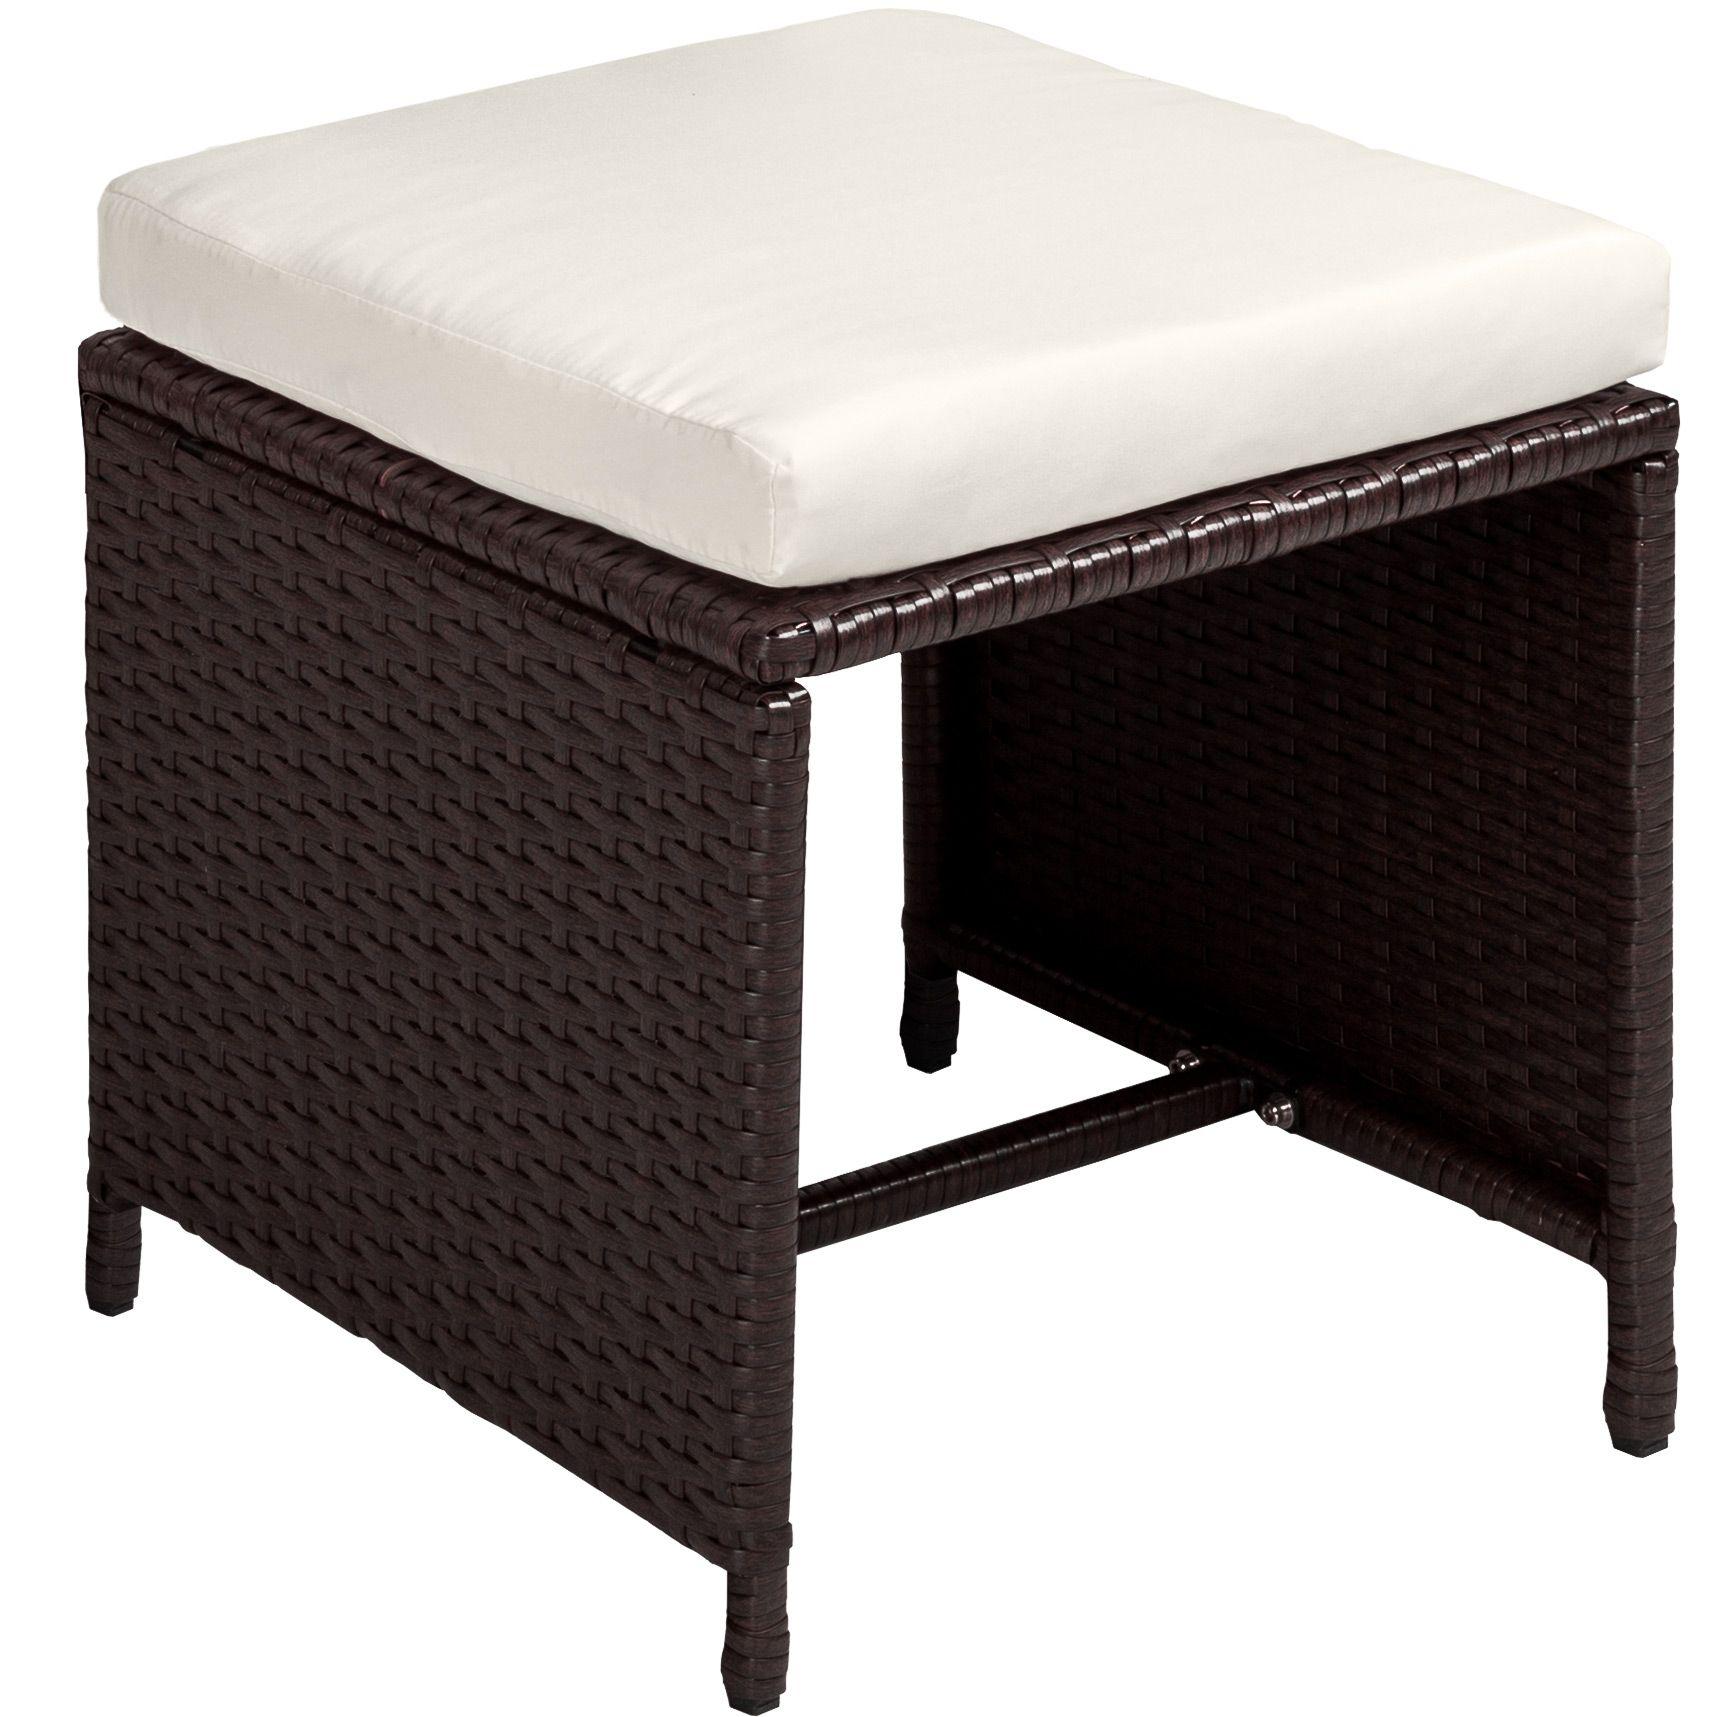 Set di mobili da giardino poli rattan arredamento 8 sedie tavolo 4 sgabelli ebay - Ebay mobili da giardino ...